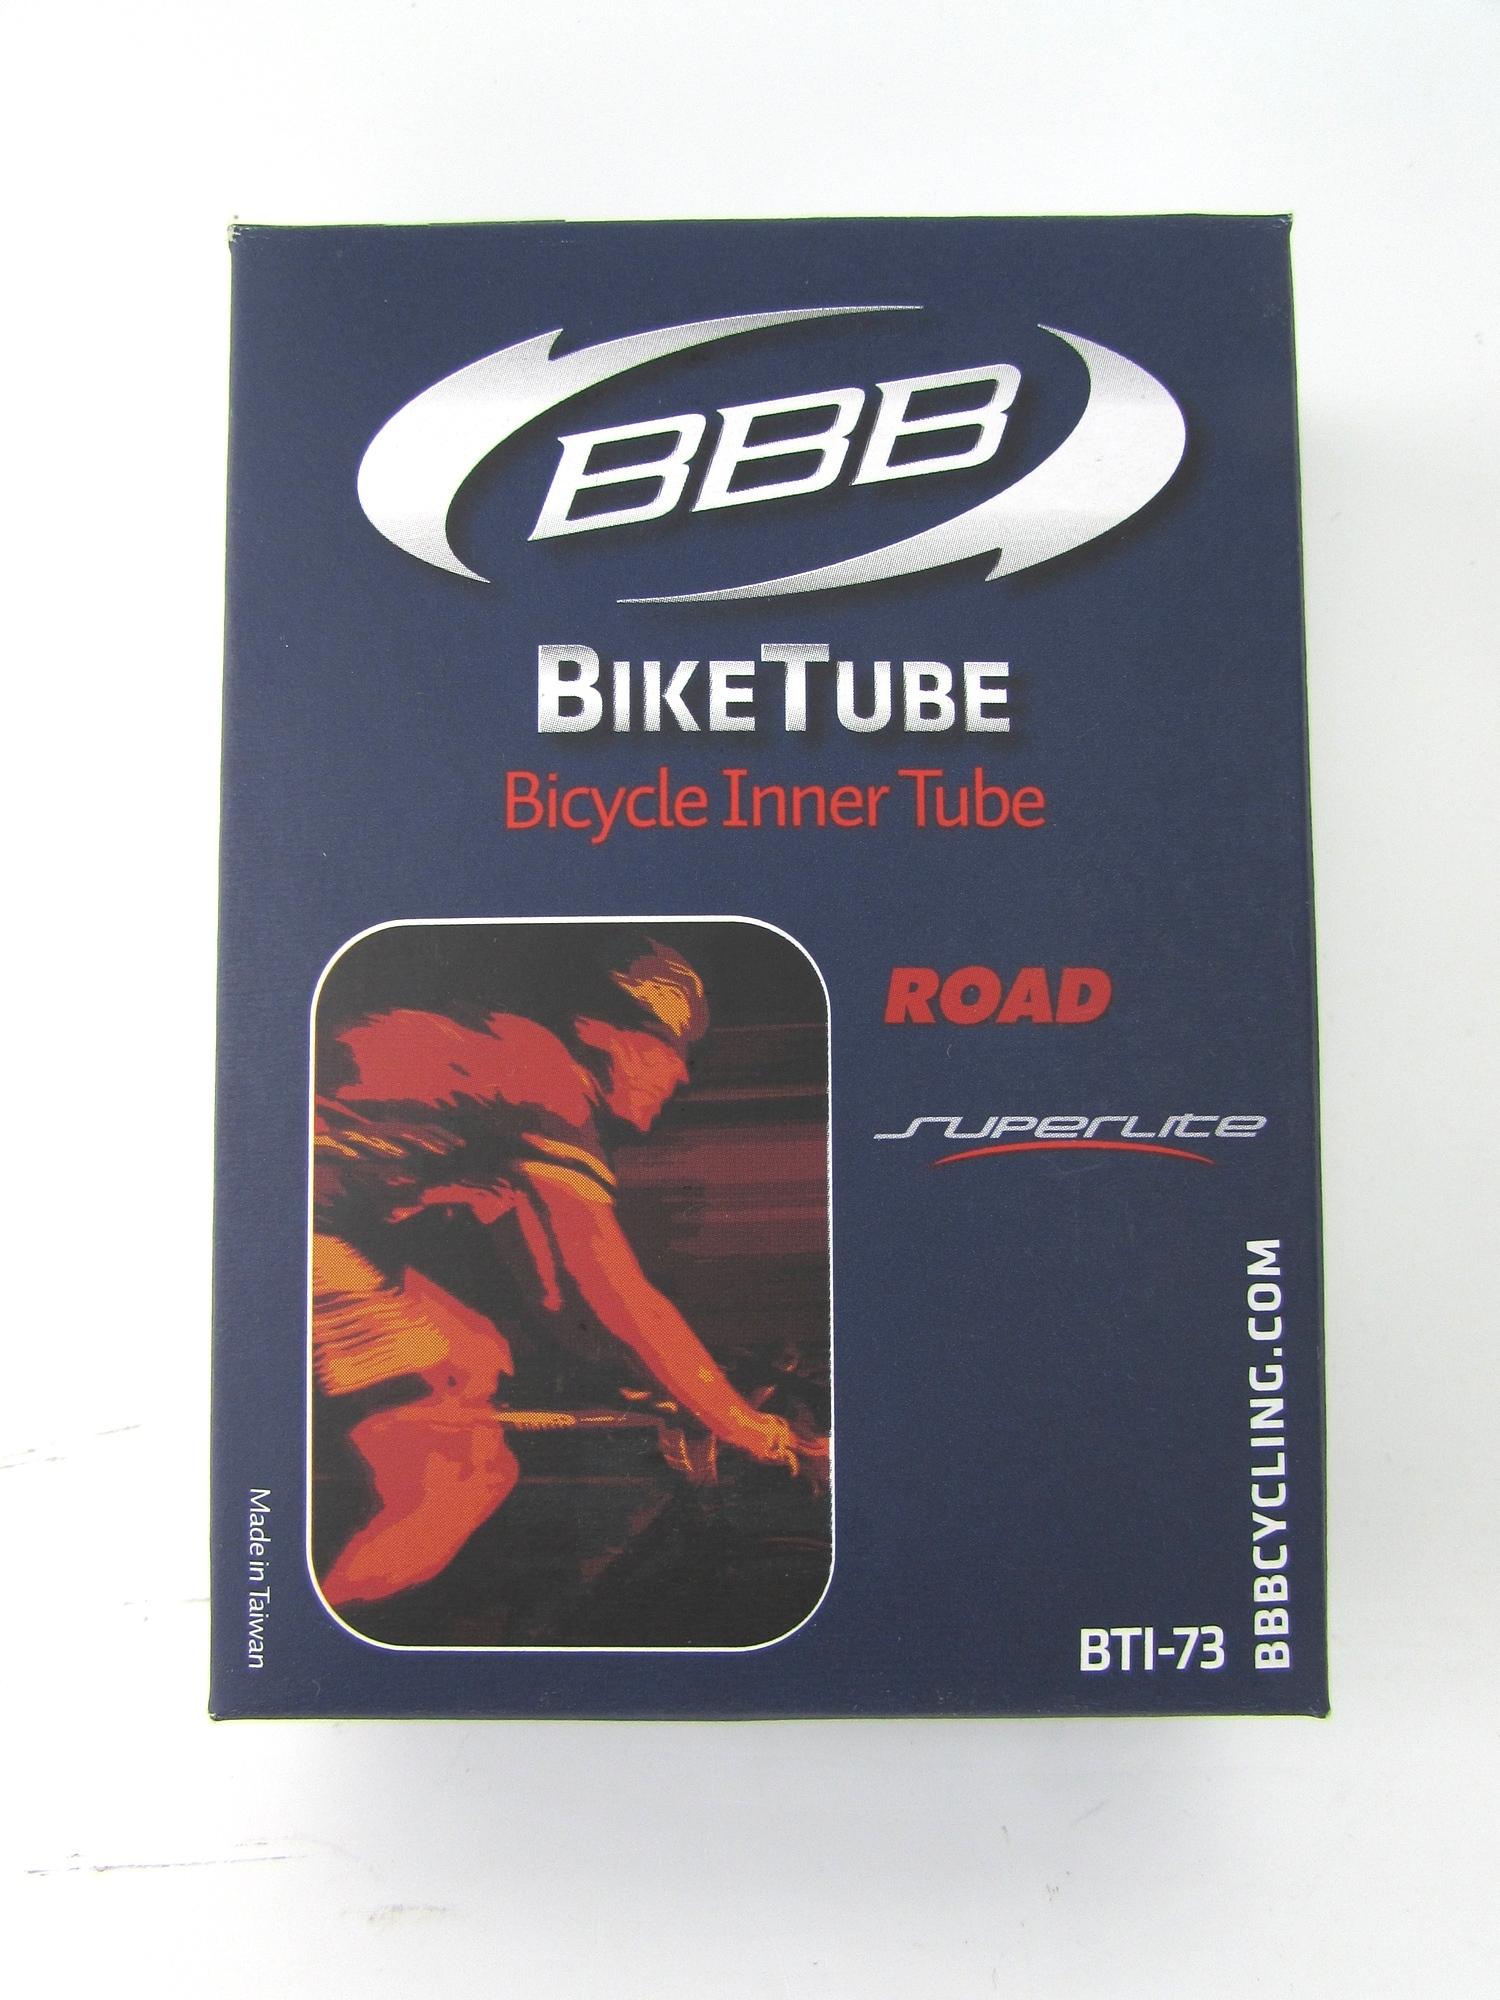 bbb bti-73